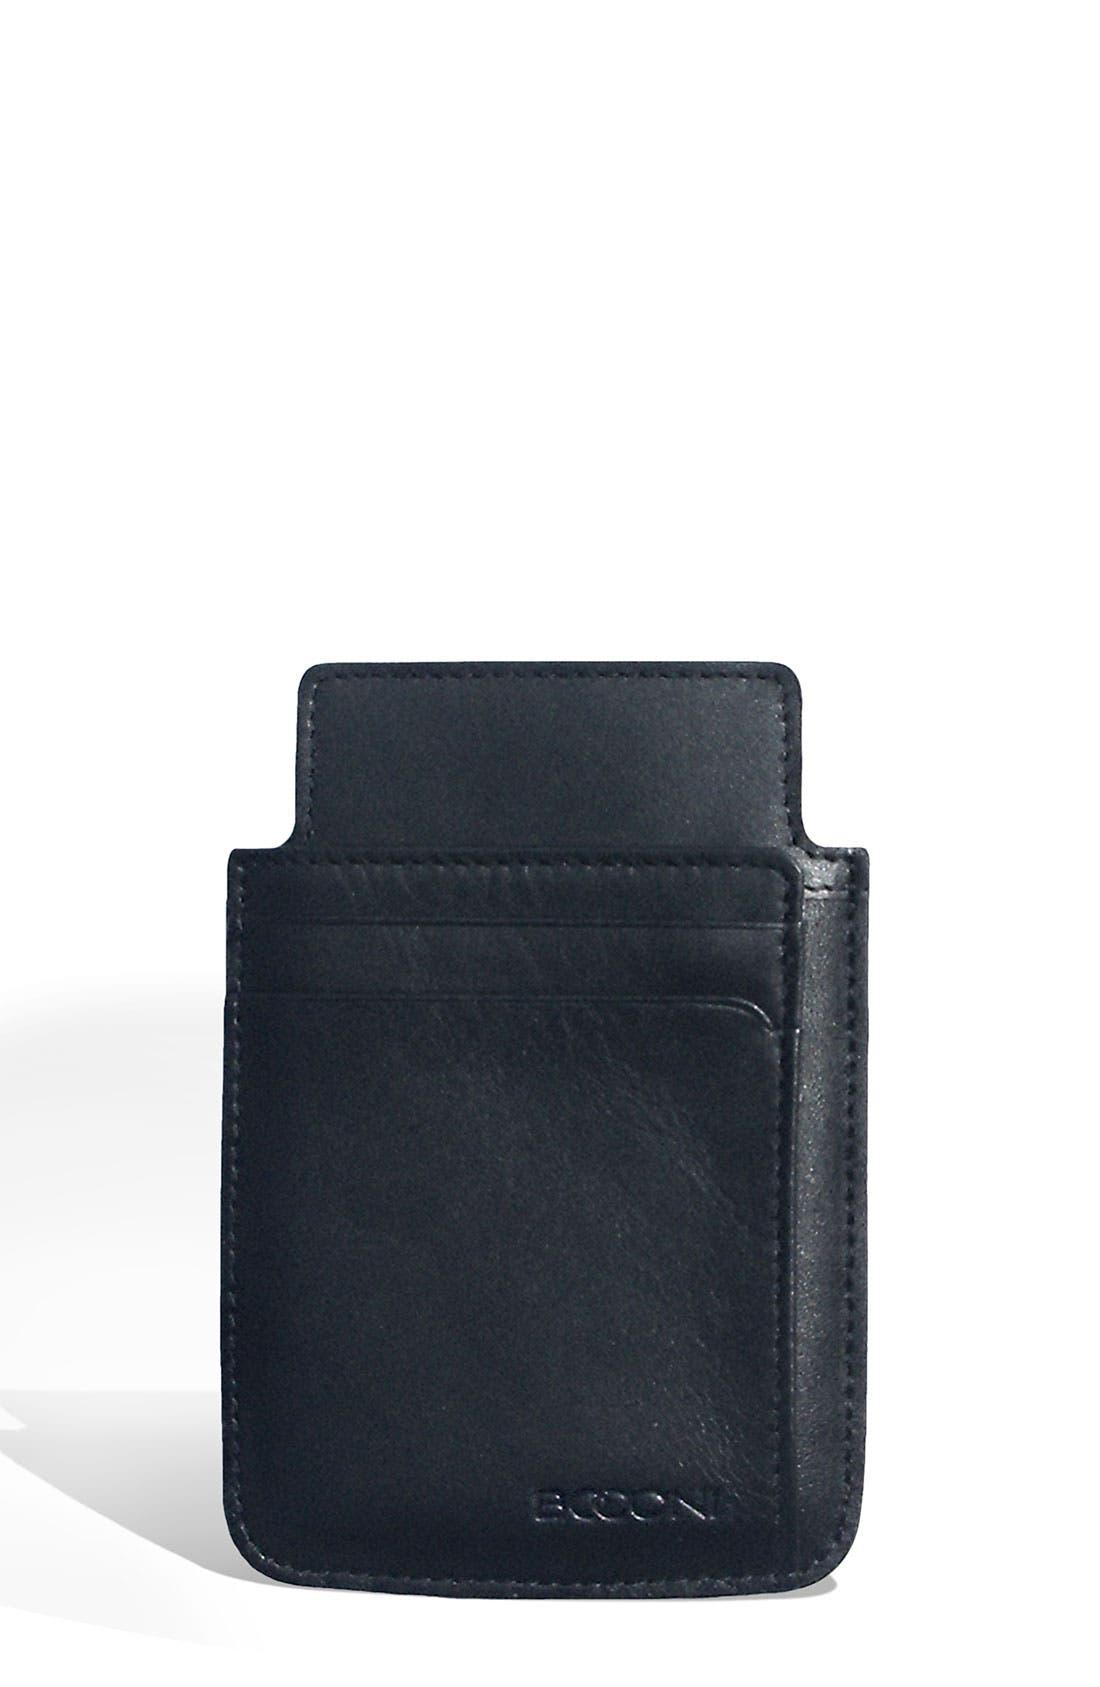 Main Image - Boconi Leather Smartphone Sheath